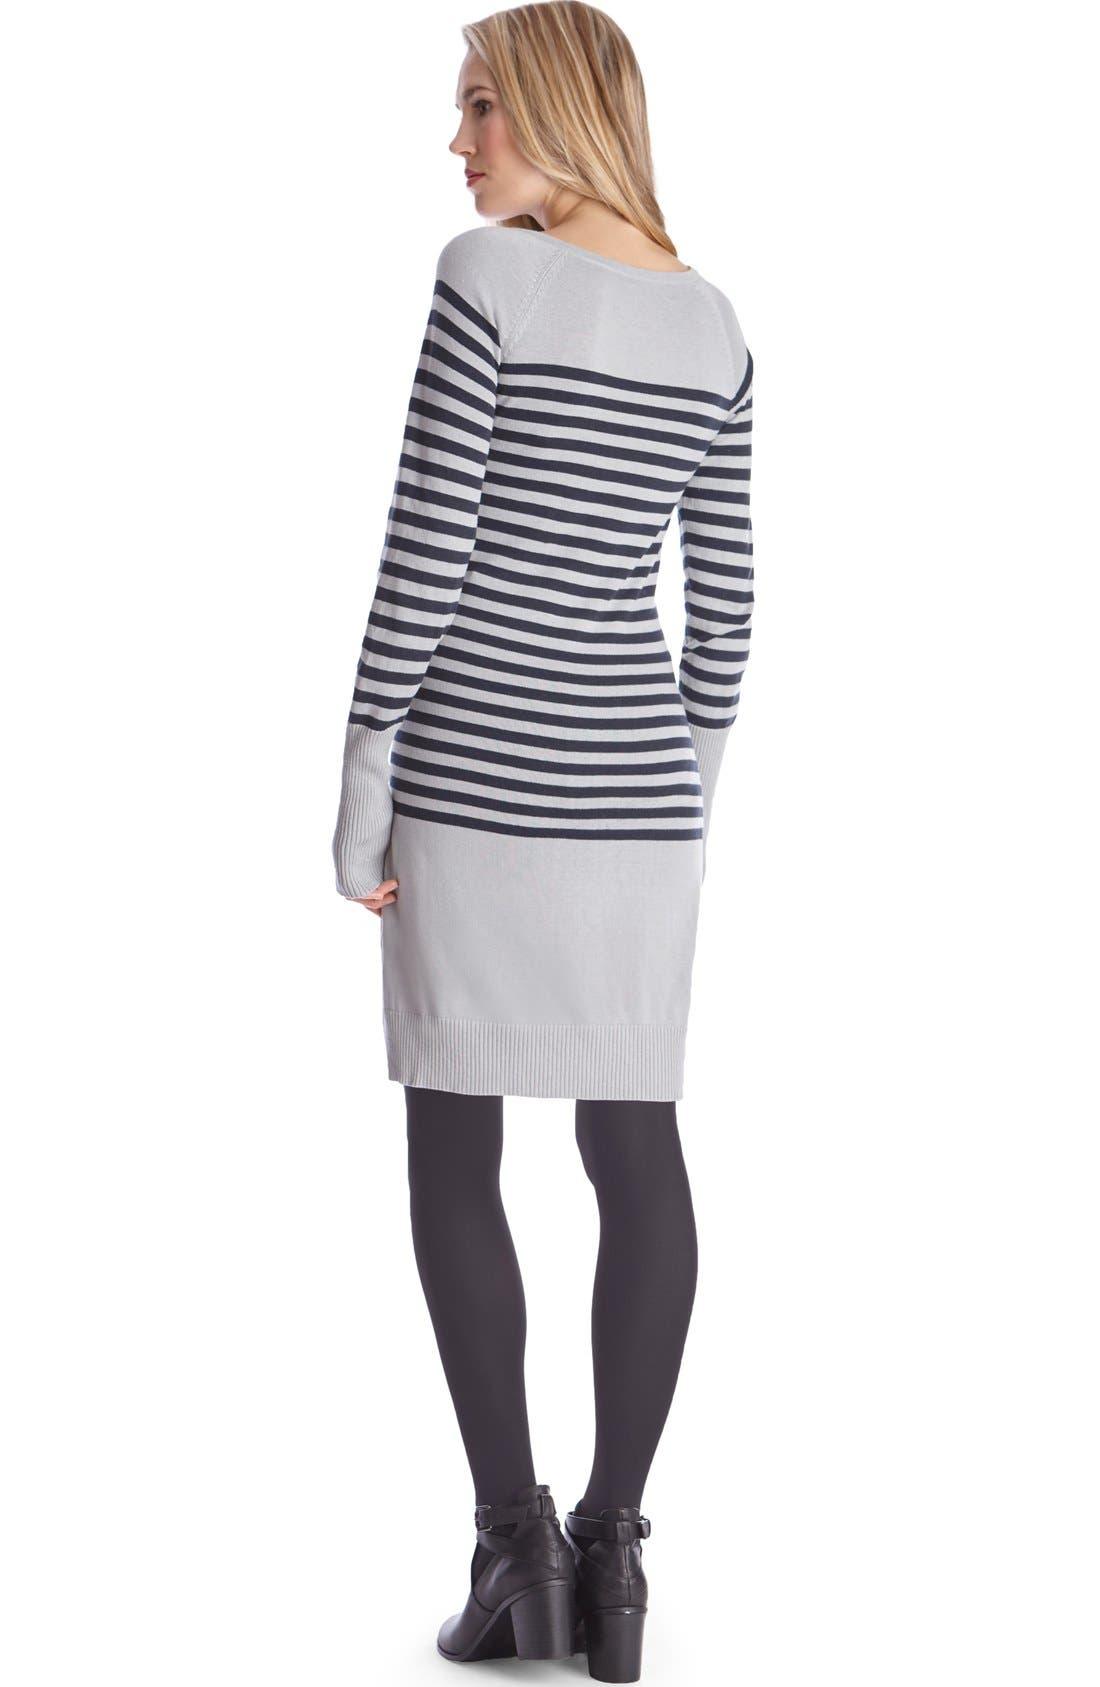 Alternate Image 2  - Seraphine'Rozalia' Stripe Maternity/Nursing Sweater Dress